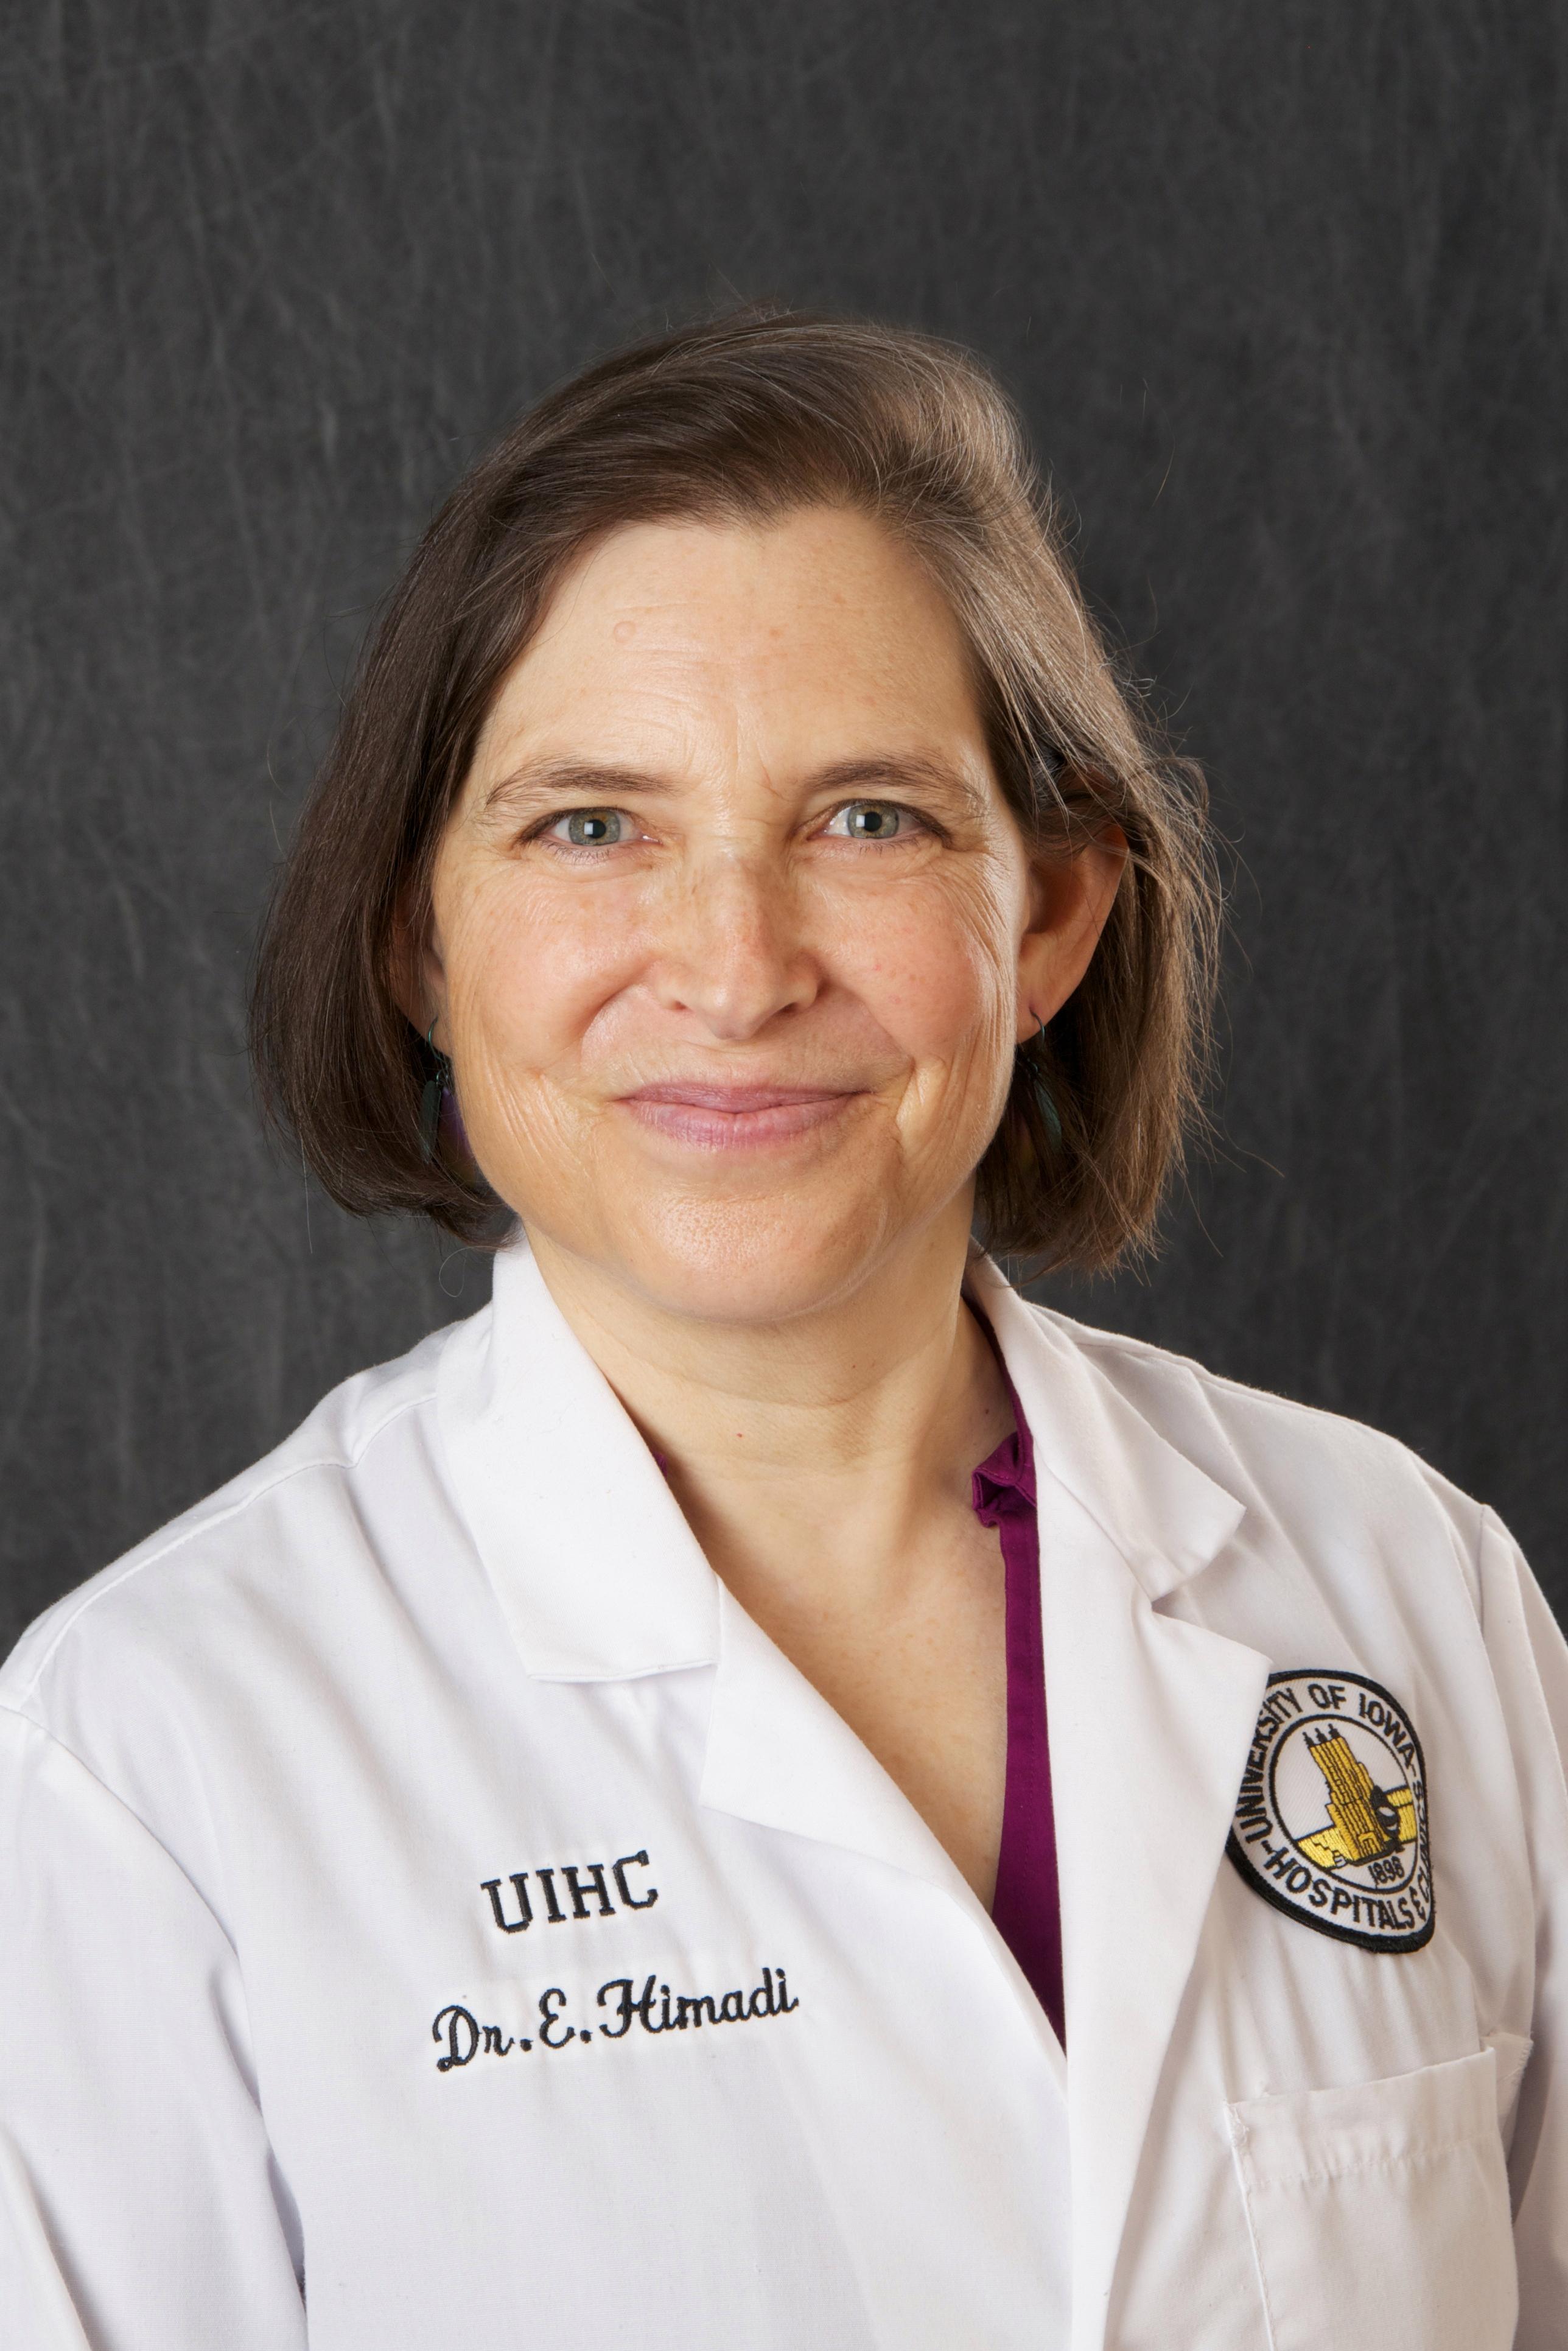 Elaine Himadi, MD